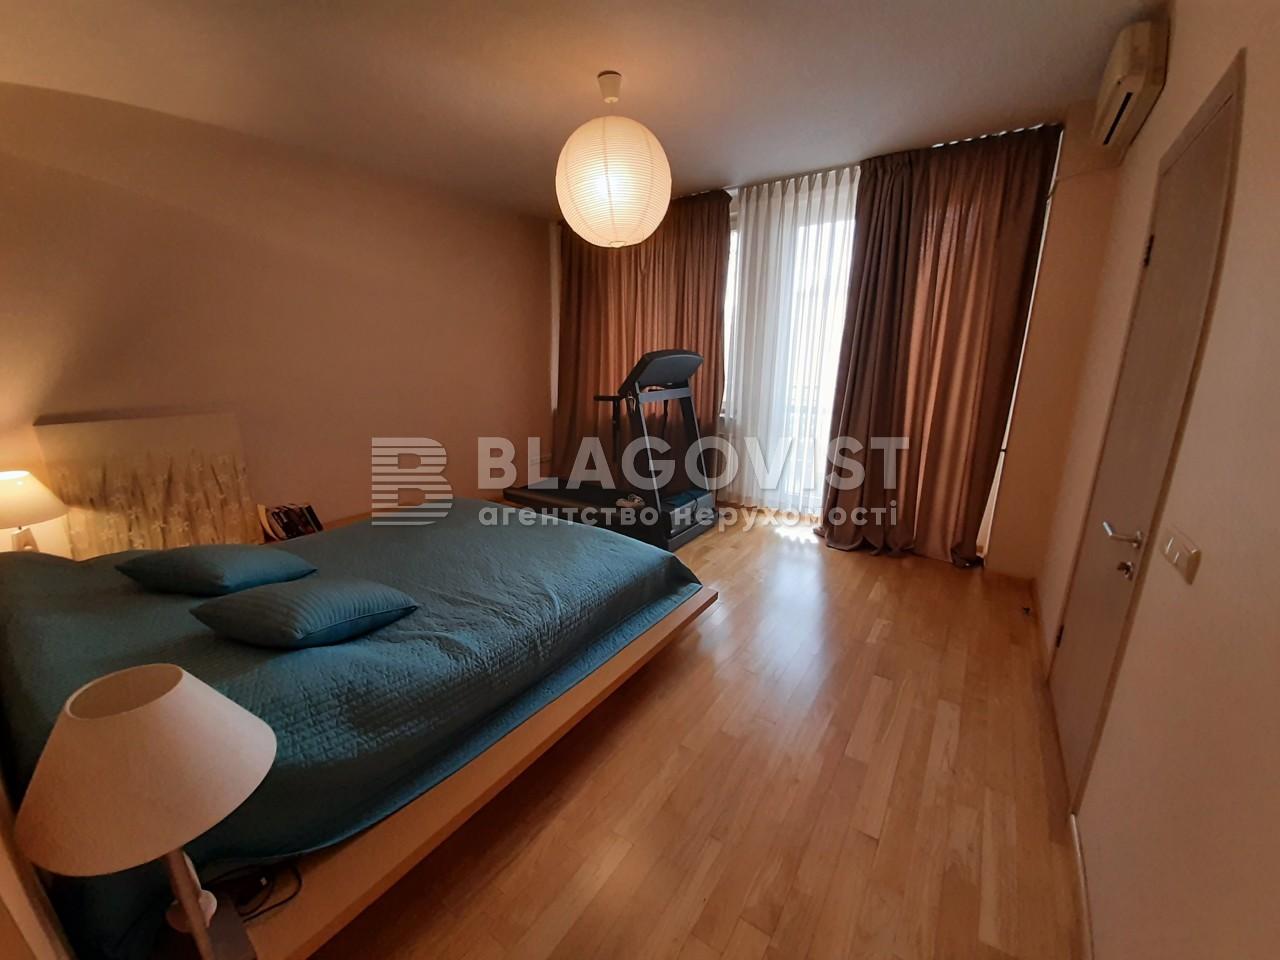 Квартира P-9079, Бутышев пер. (Иванова Андрея), 13, Киев - Фото 12